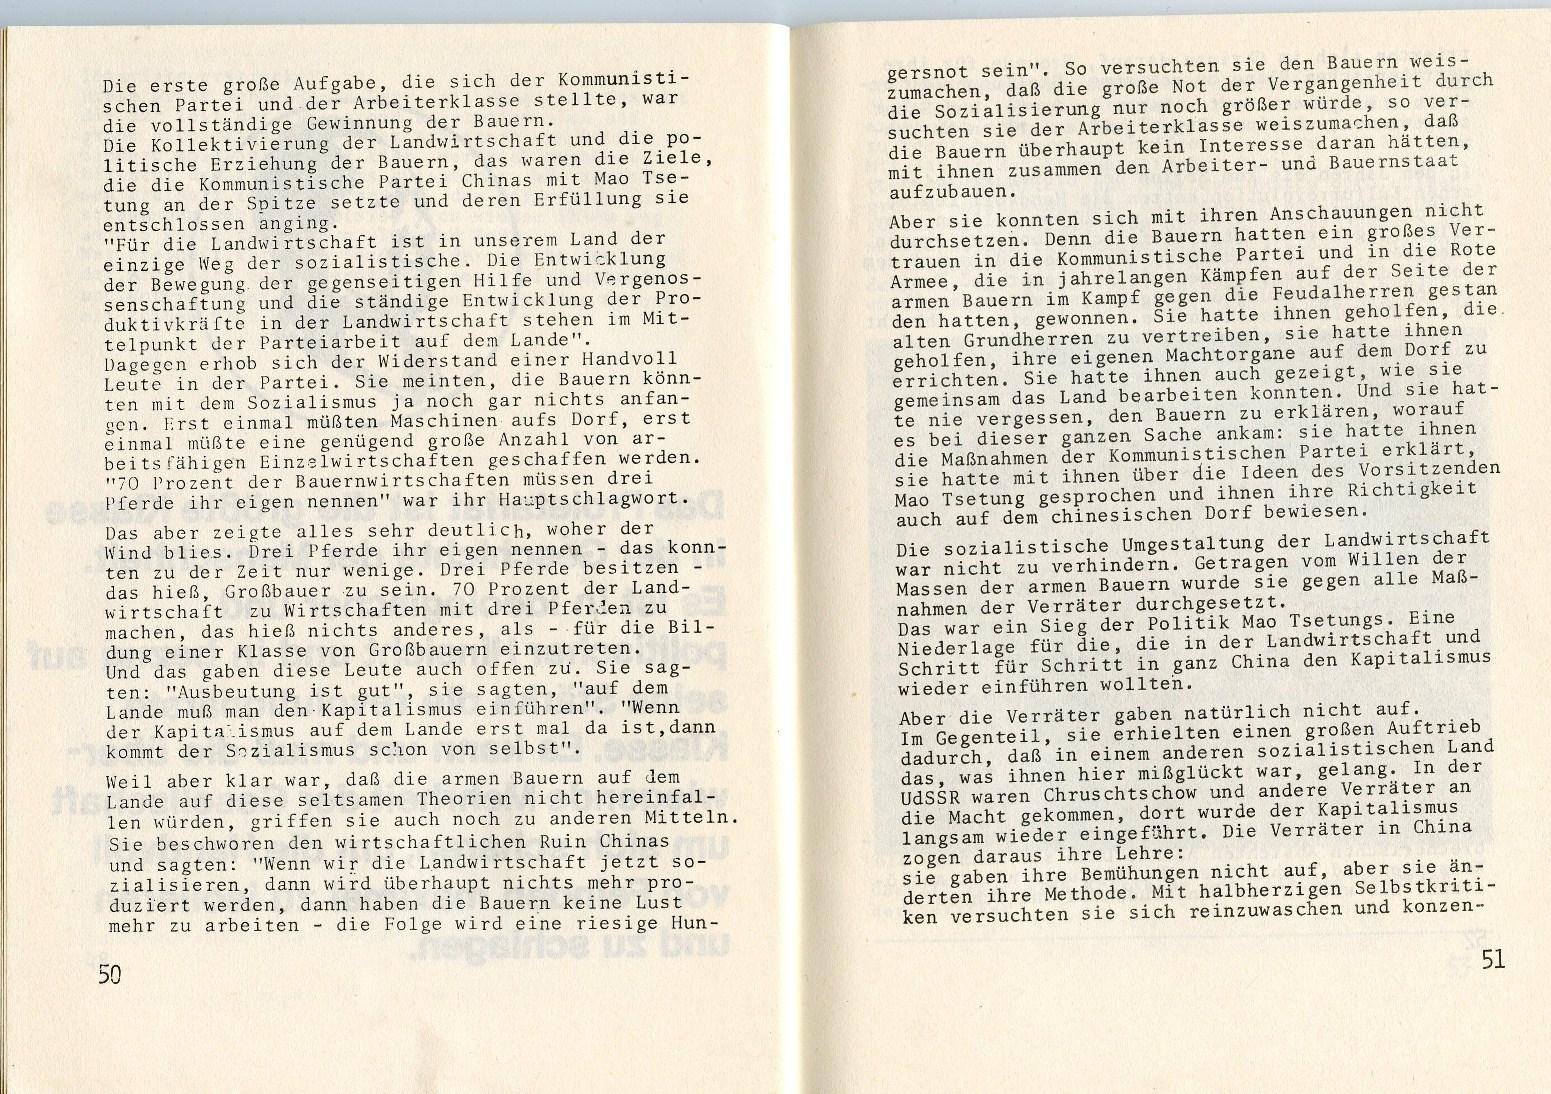 ZB_KPChinas_1971_27